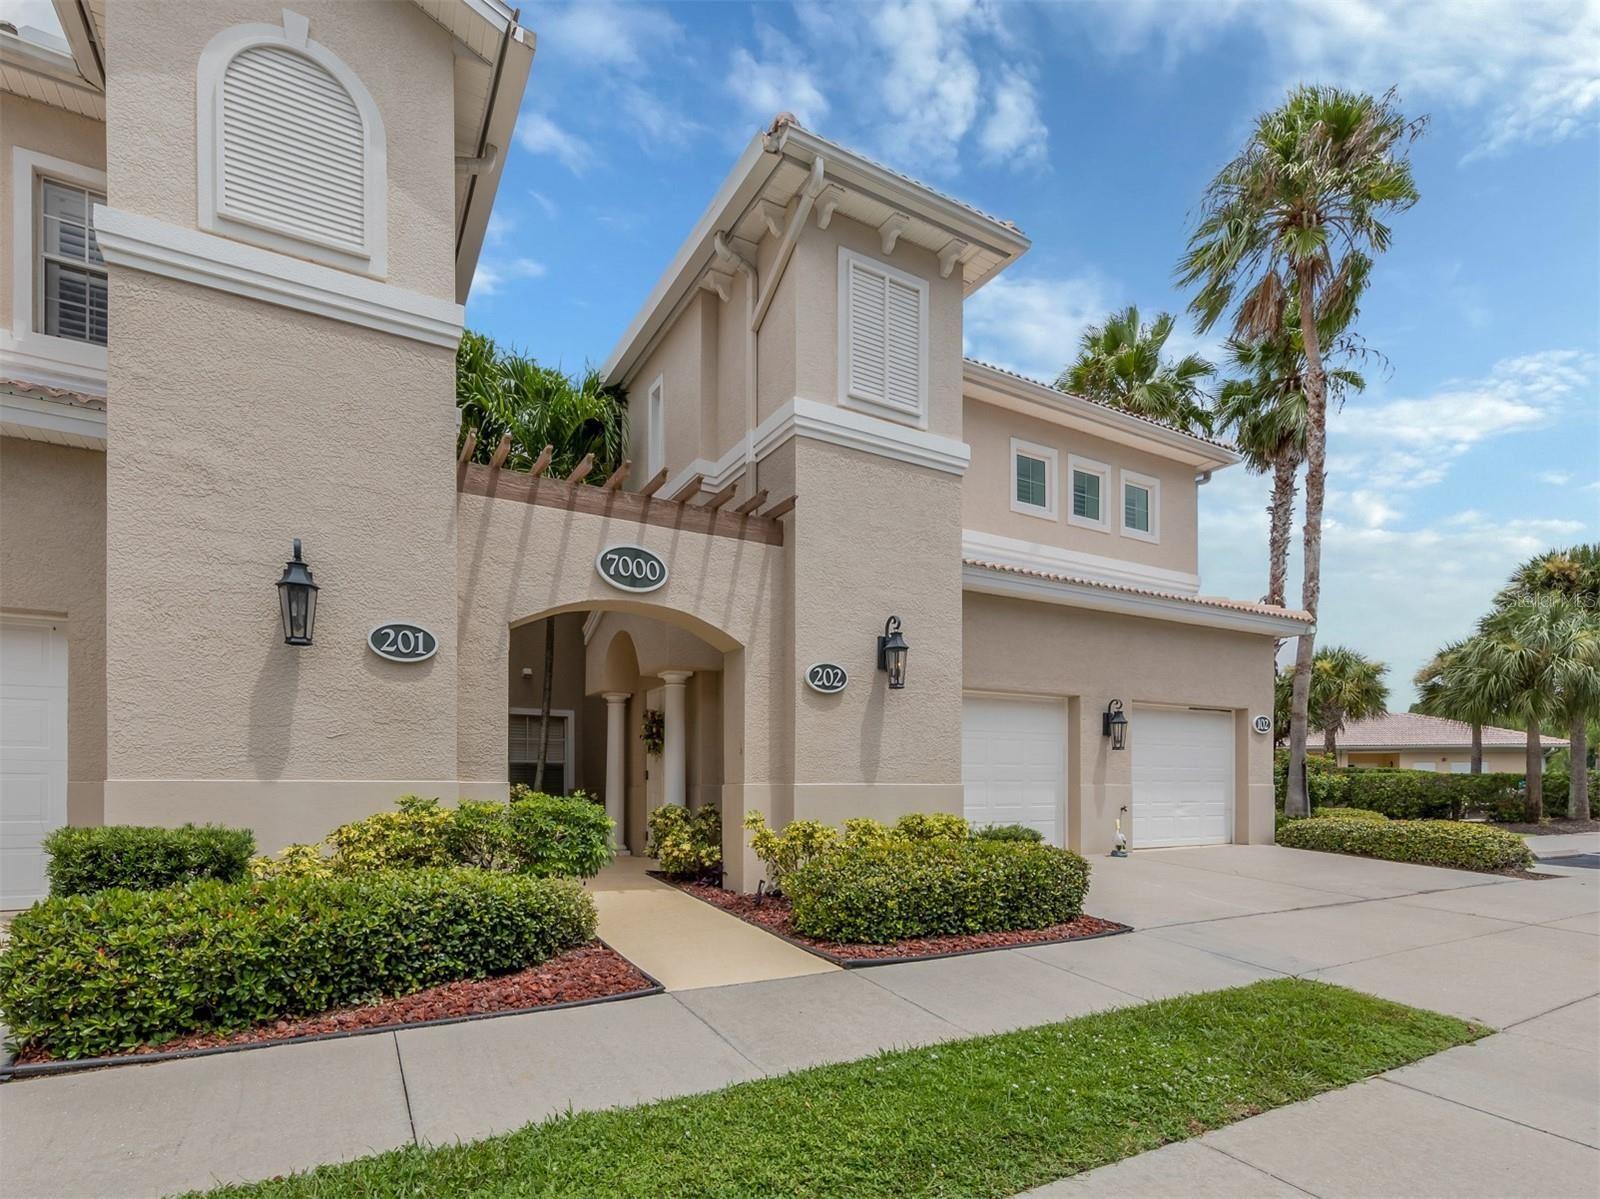 Photo of 7000 IBIS WAY #202, VENICE, FL 34292 (MLS # N6117279)